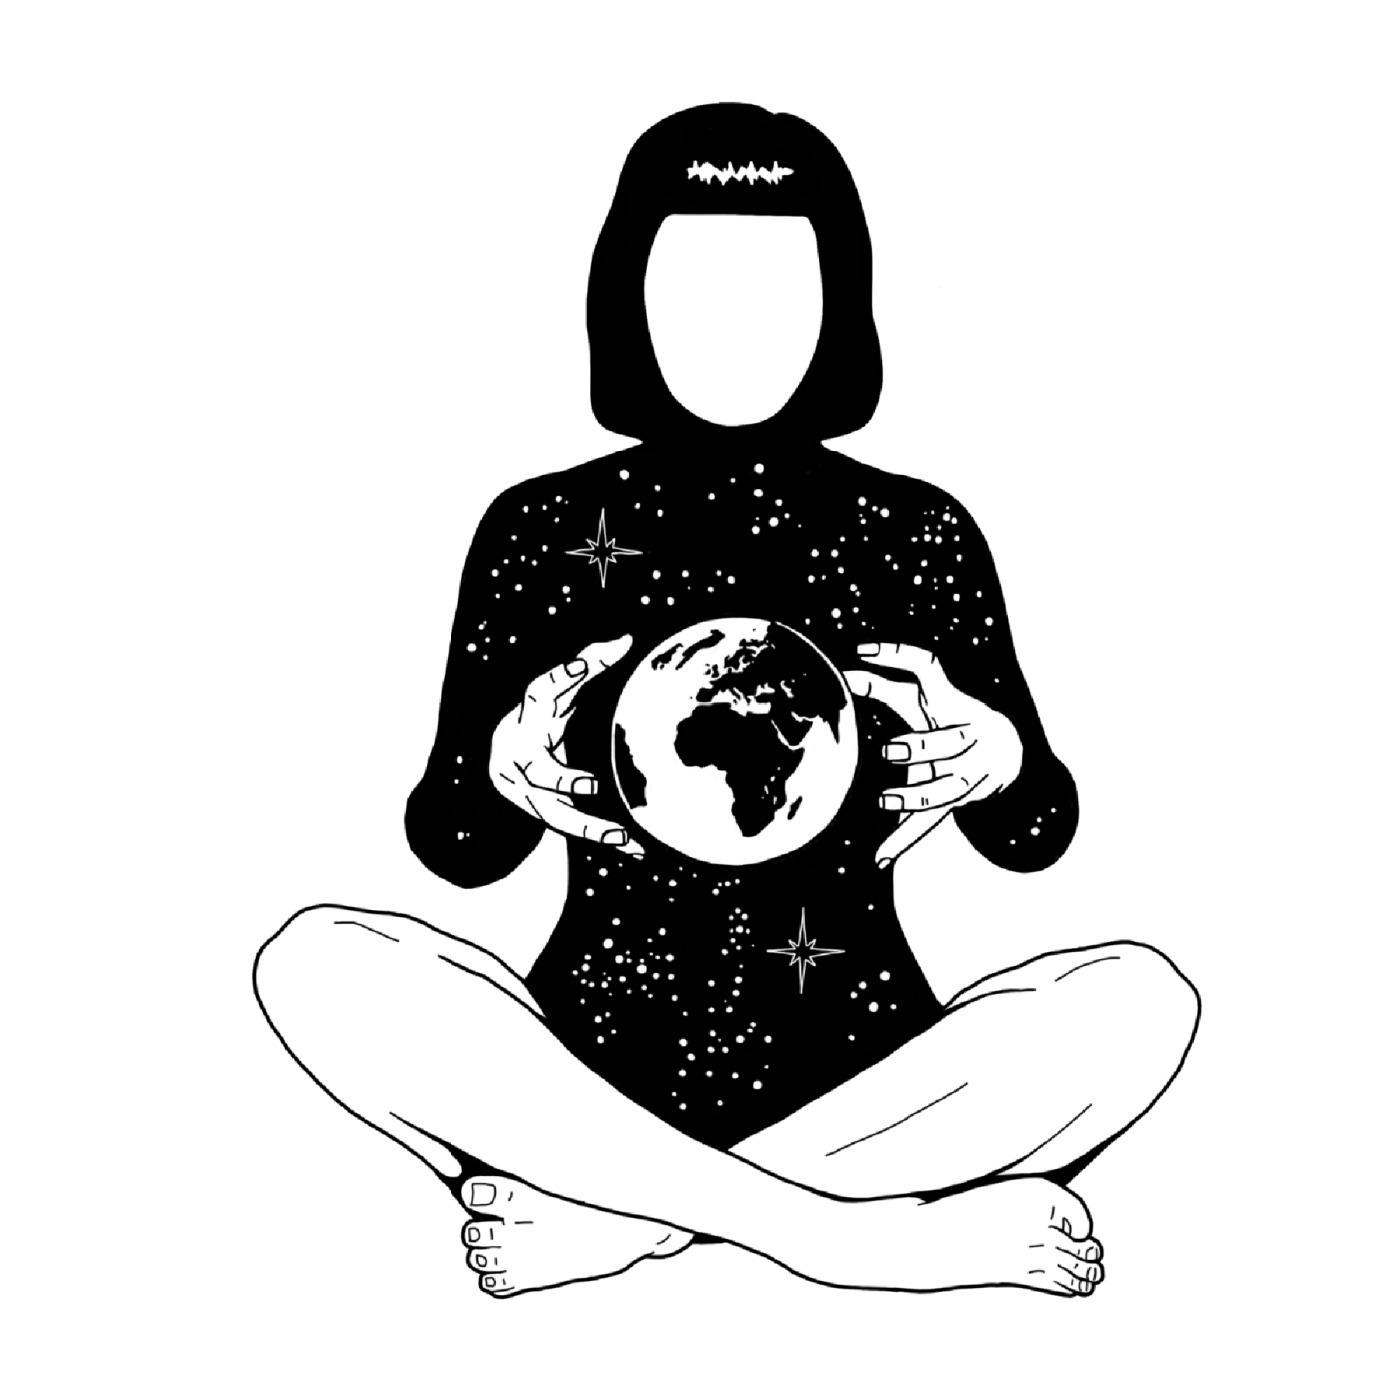 Alana Fairchild on Channeling, Divine Feminine Energy Work + Saraswati Healing